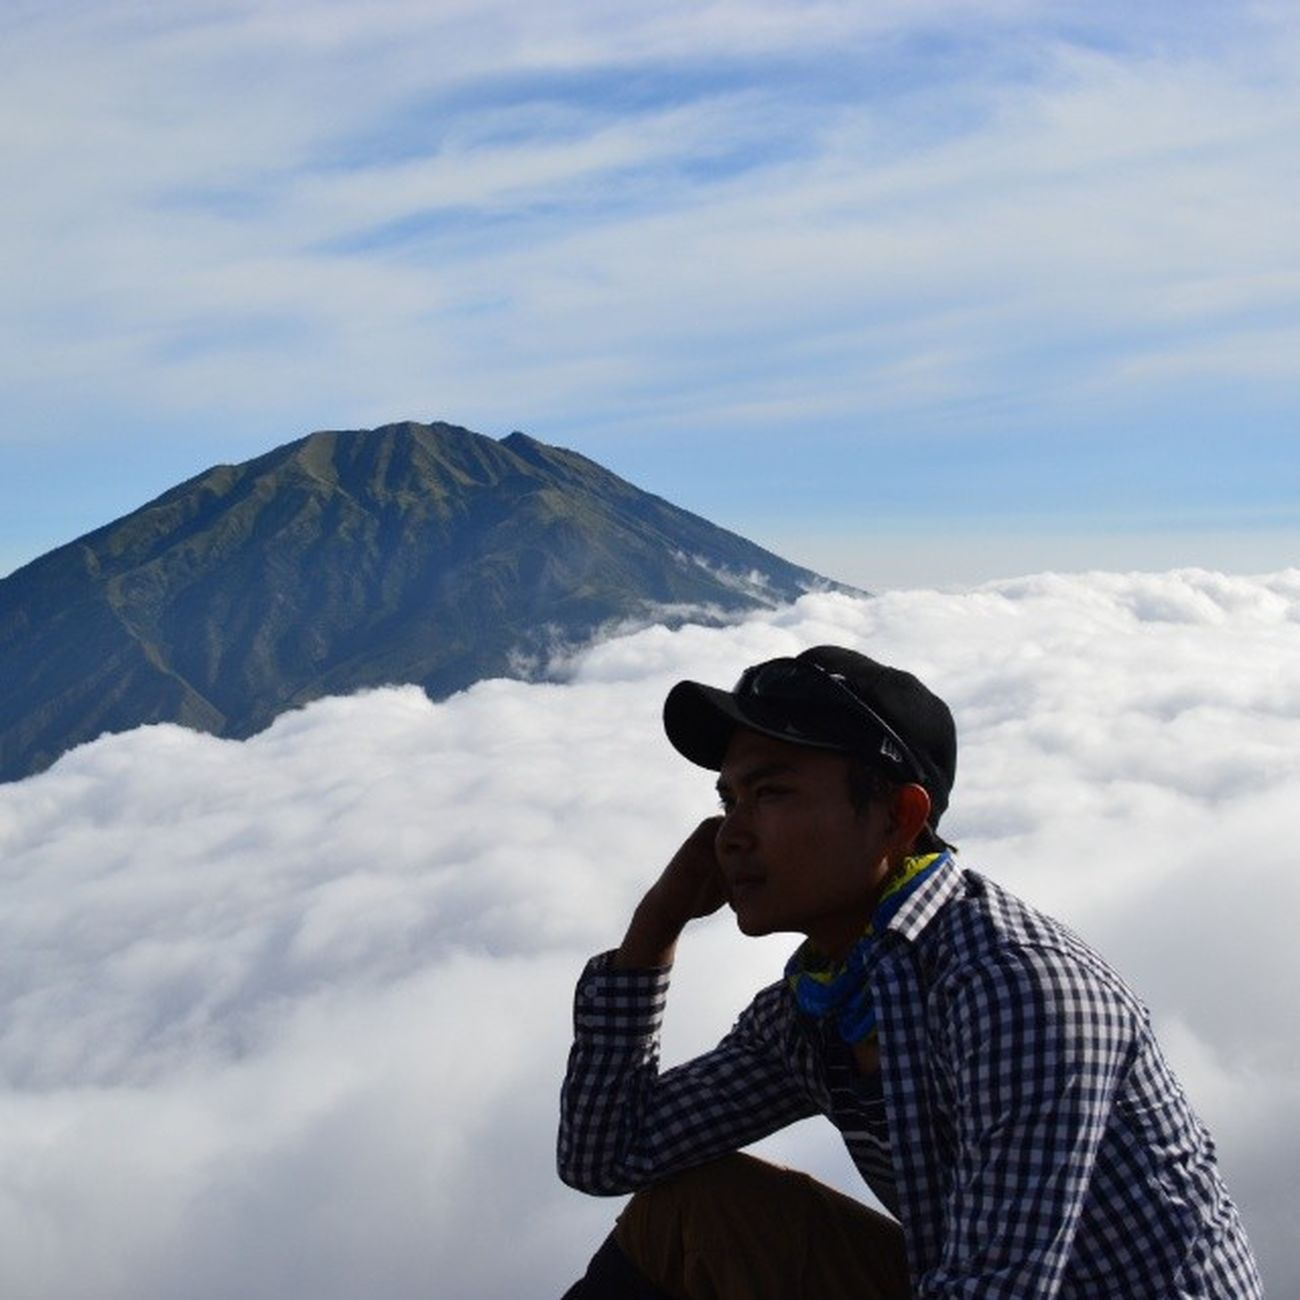 Edisi_galau Naek gunung mulu.... Kapan naek pelaminannya (?) haha poke @ubangarmet @noviaopy Mountainer Mytrip MyAdventure cloudyweather skyland